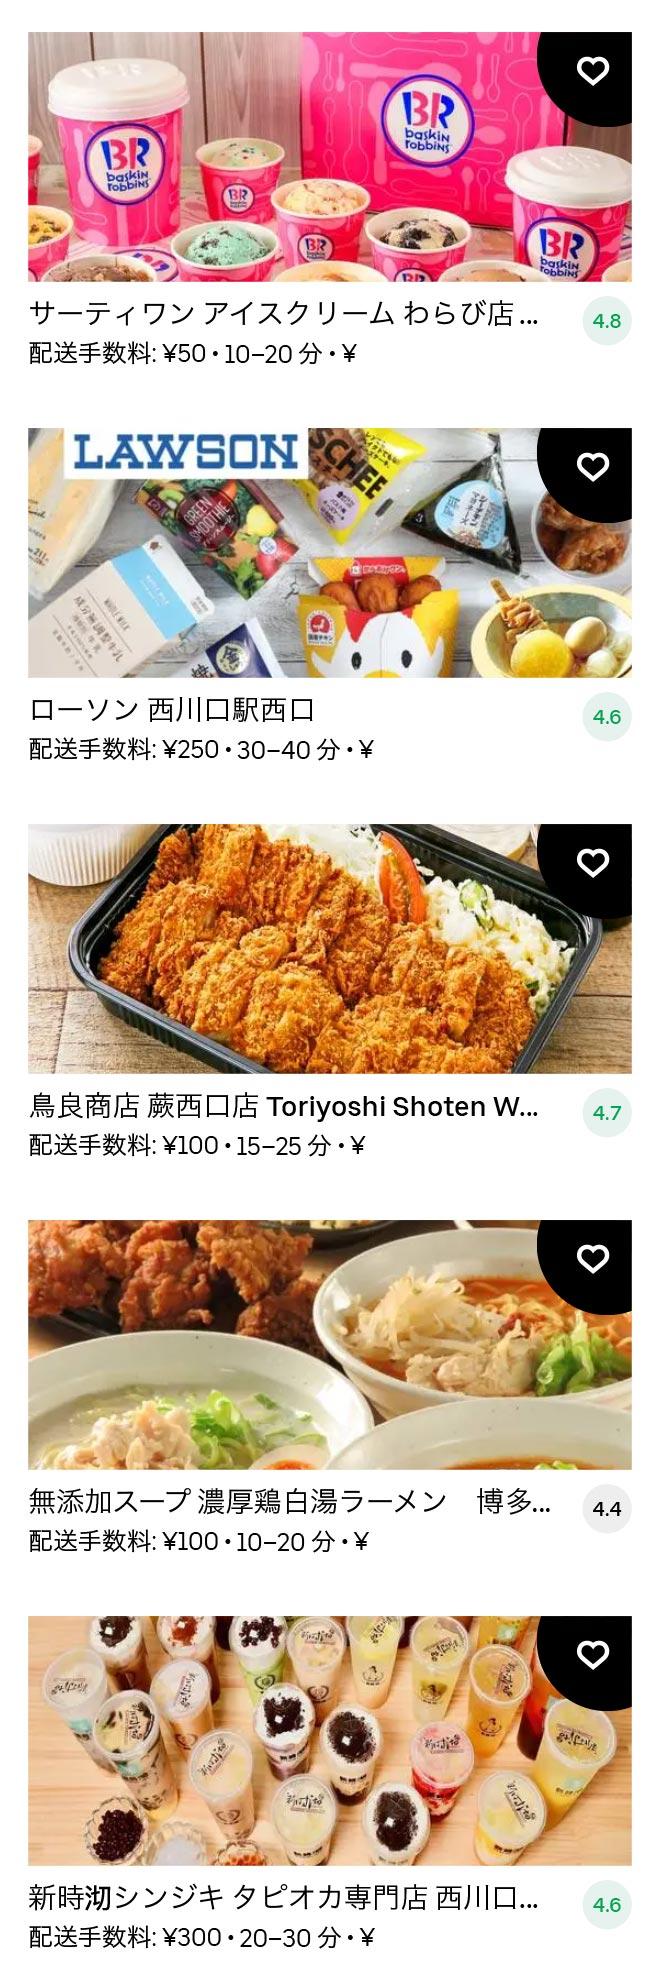 Warabi menu 2011 13